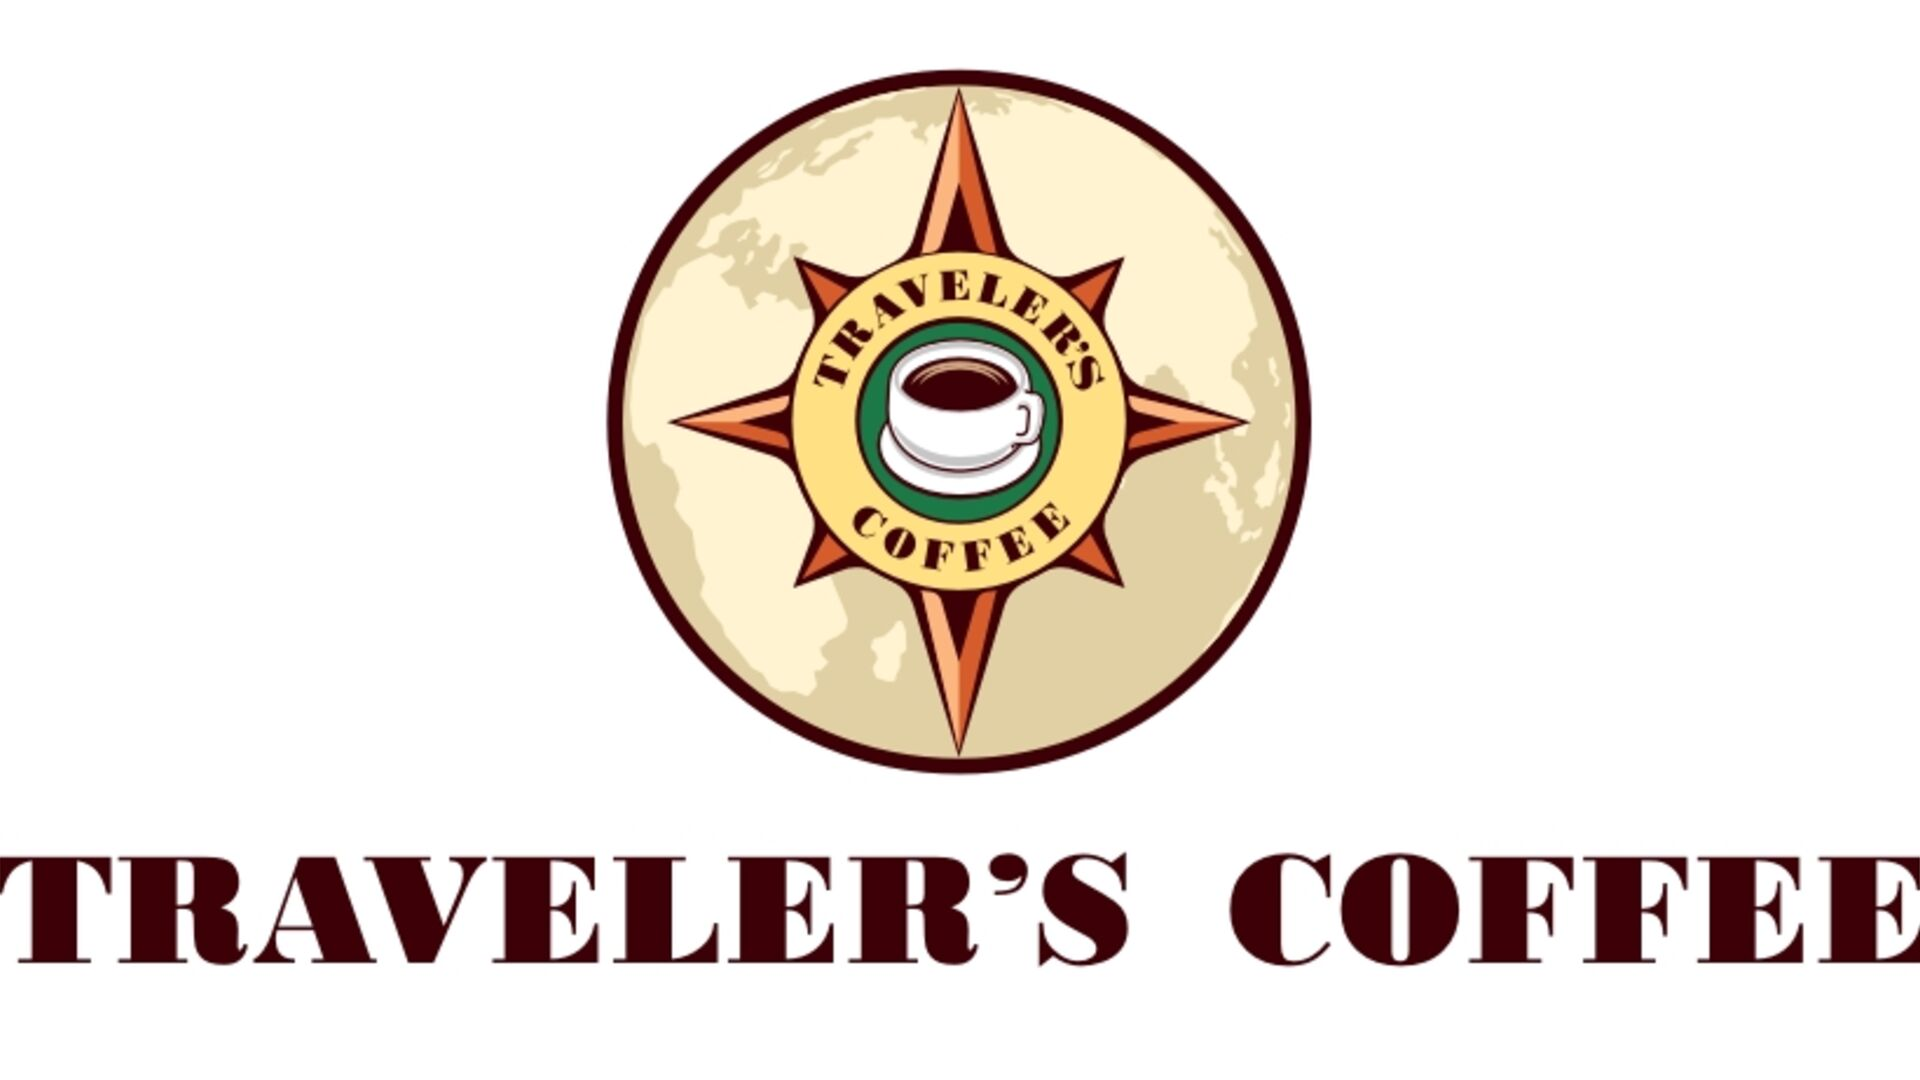 Travelers-coffee